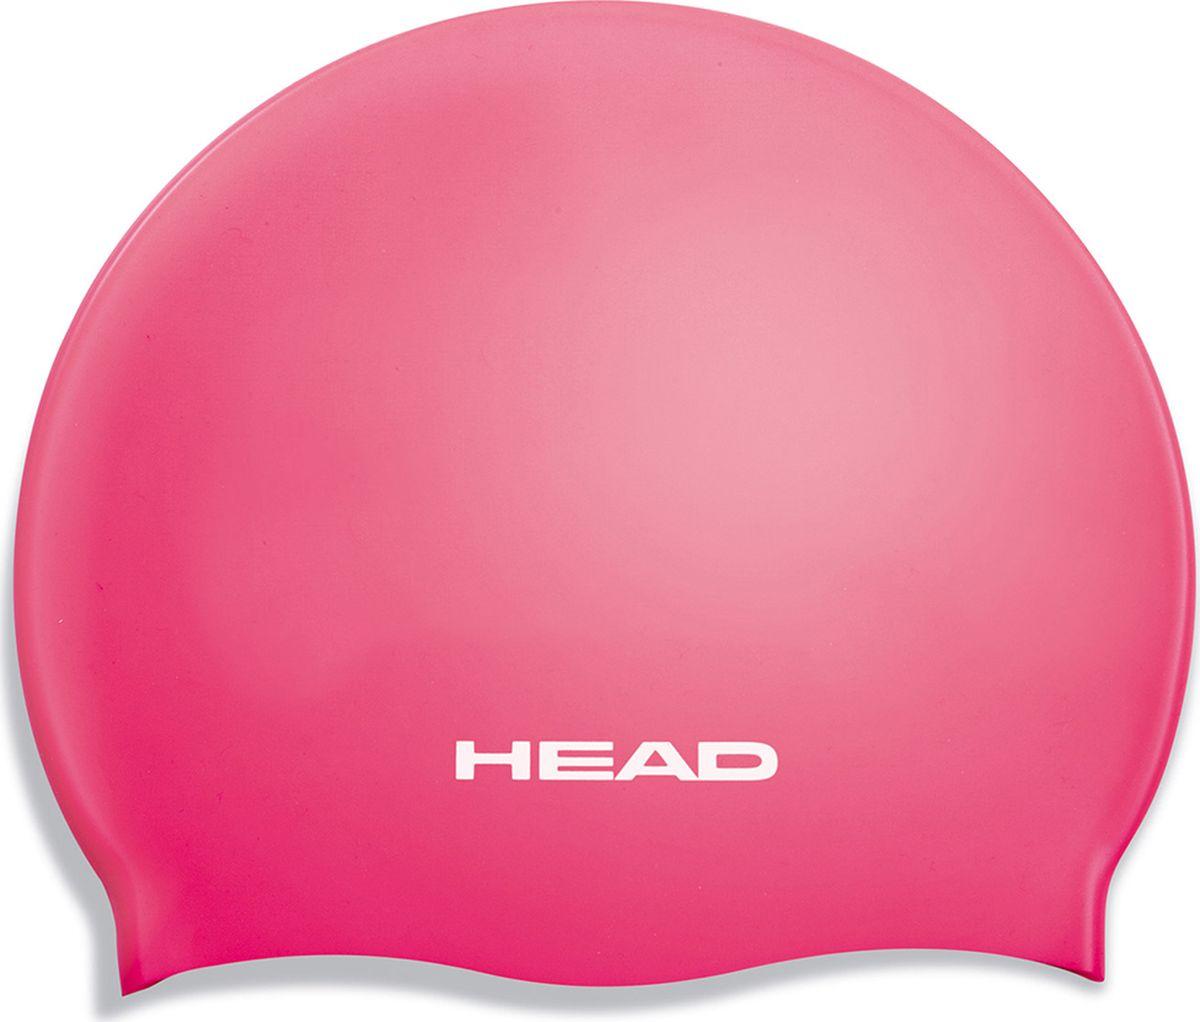 цены на Шапочка для плавания детская HEAD